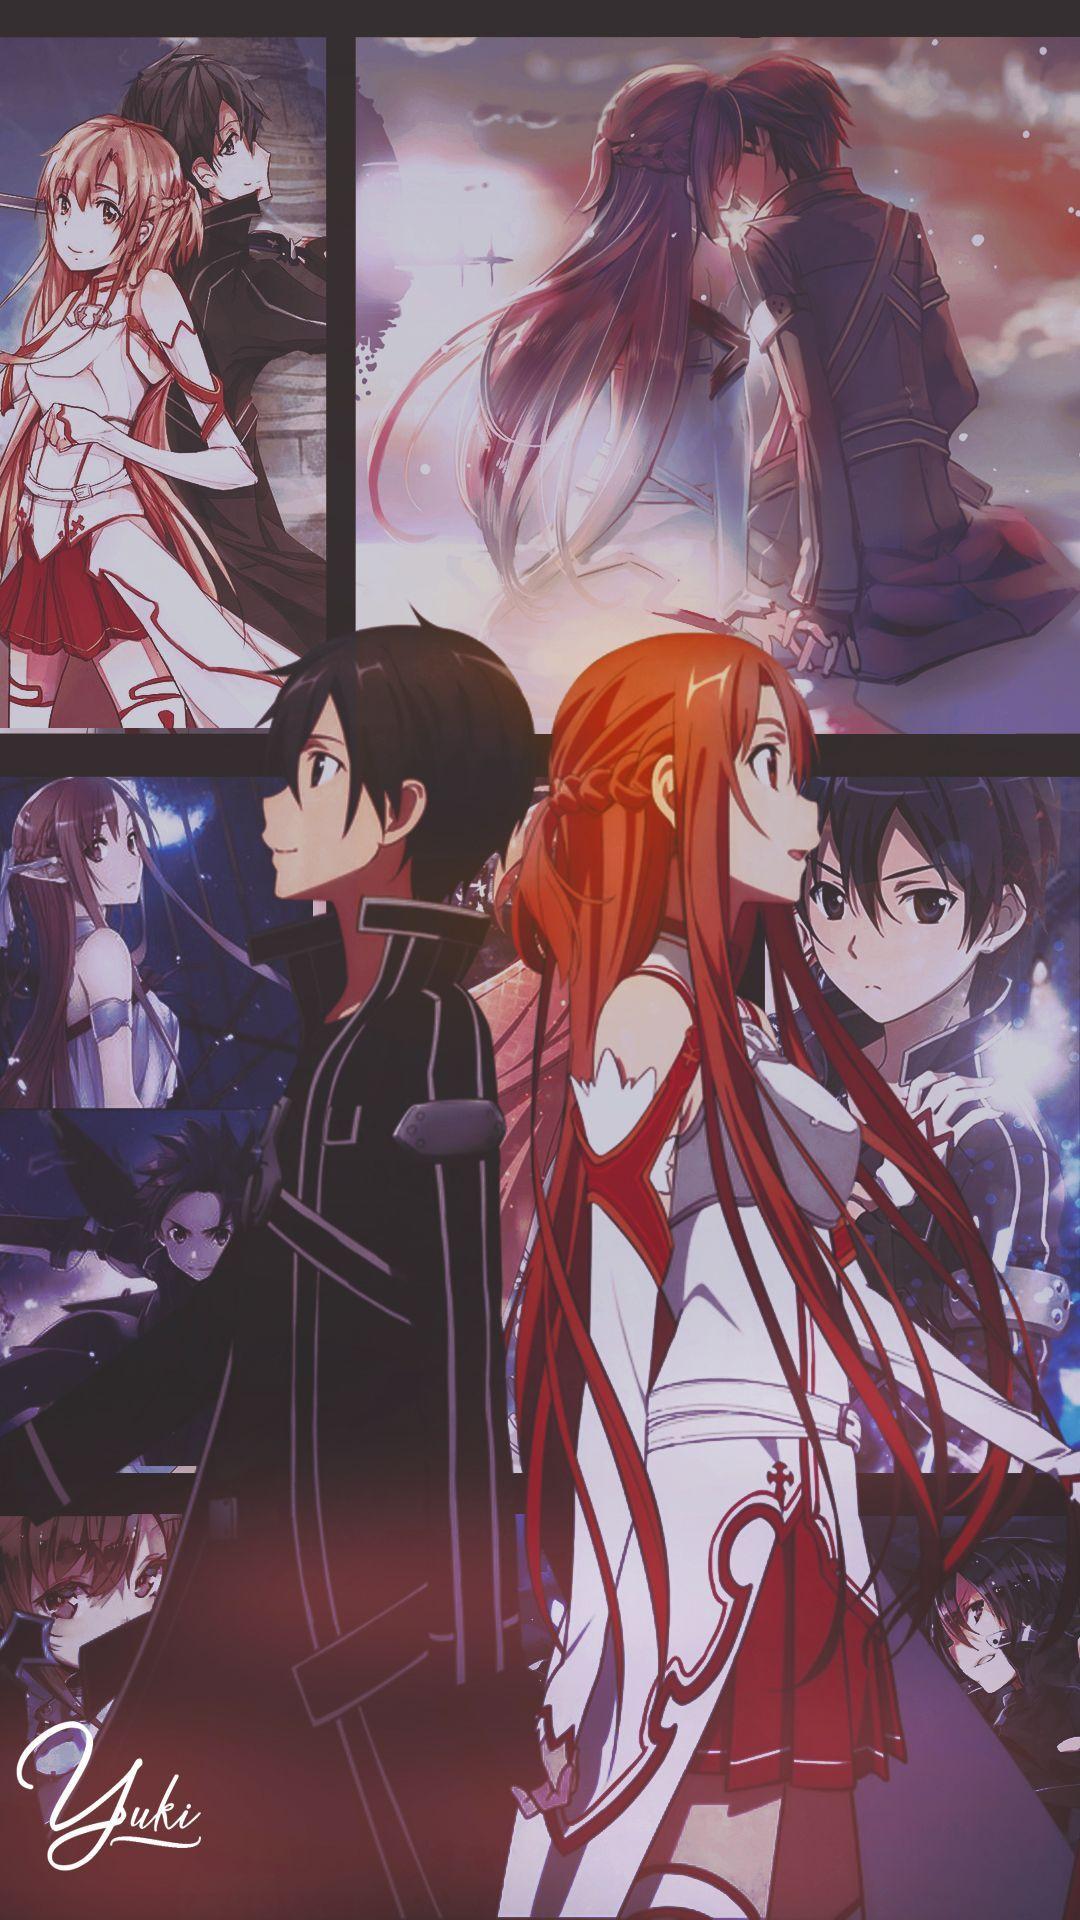 Most Beautiful Anime Wallpaper Iphone Art Kirito Asuna Sao Japan Wallpaper Arts Edit In 2020 Sword Art Online Wallpaper Sword Art Online Asuna Sword Art